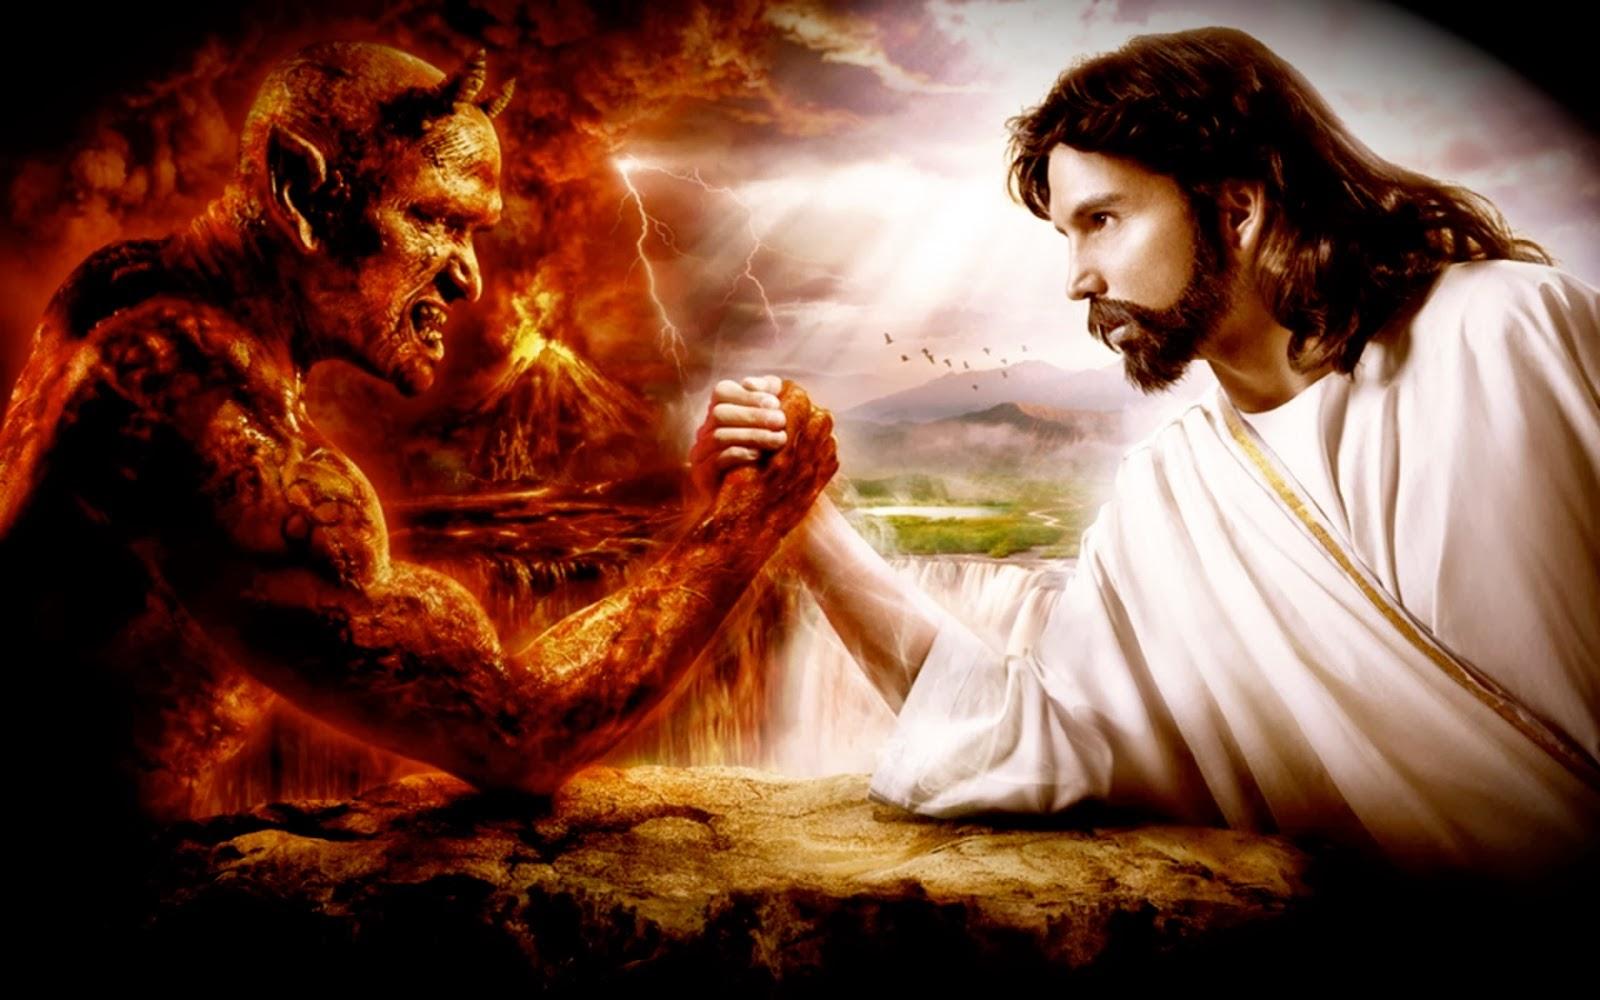 raul si binele rai si iad dumnezeu vs satana